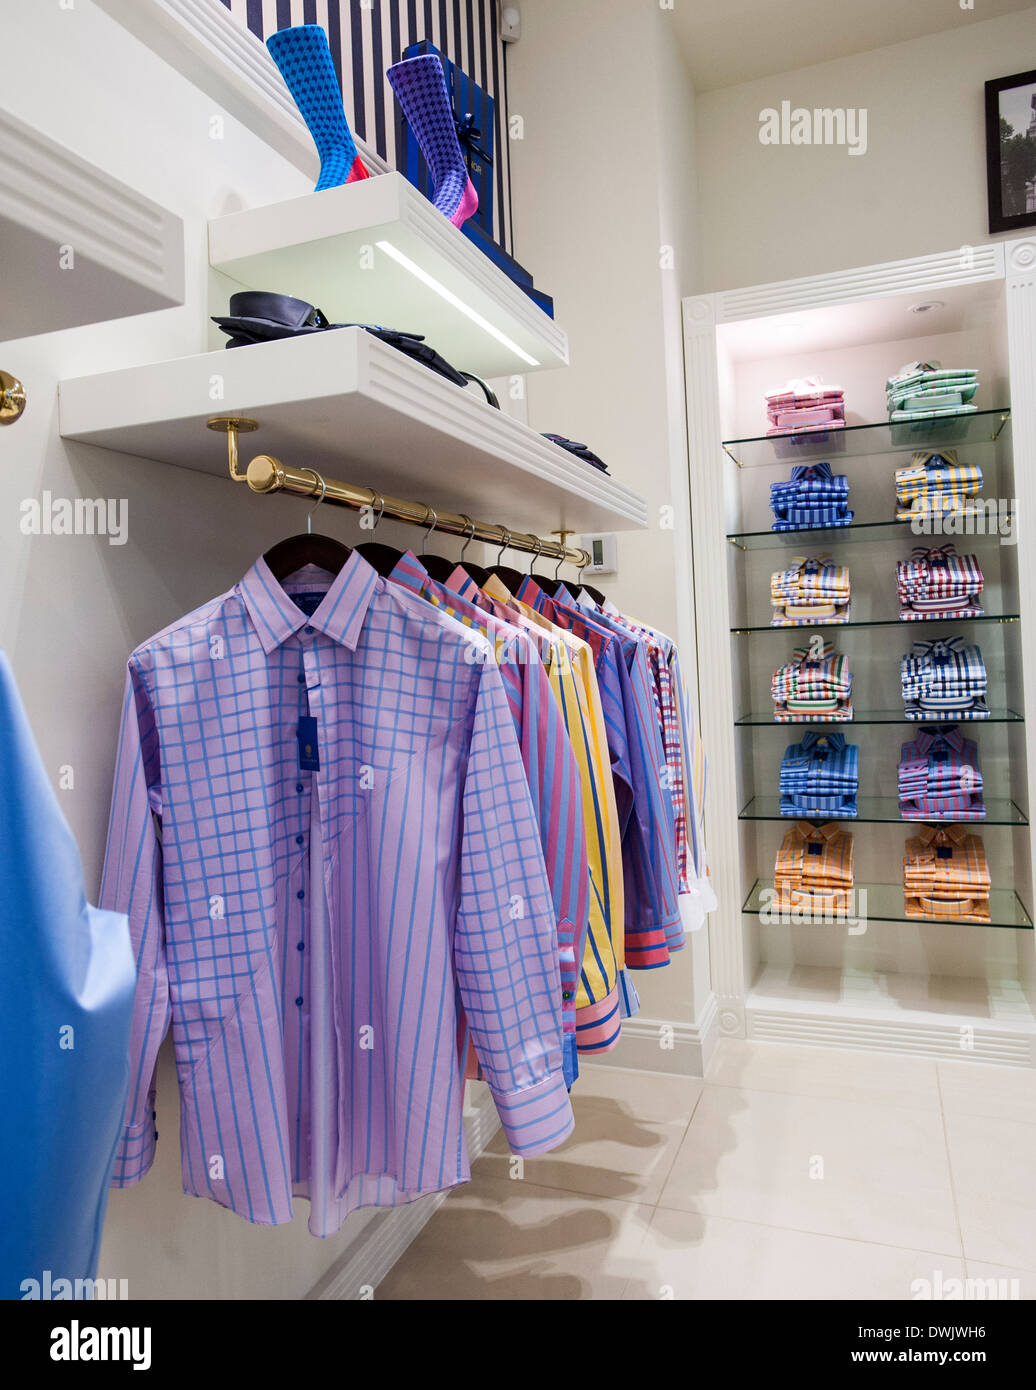 fdb9b87dbac Newly opened Grosvenor Shirts Jermyn street store. Bespoke tailored shirts  in the vein of the more modern designers of Saville R